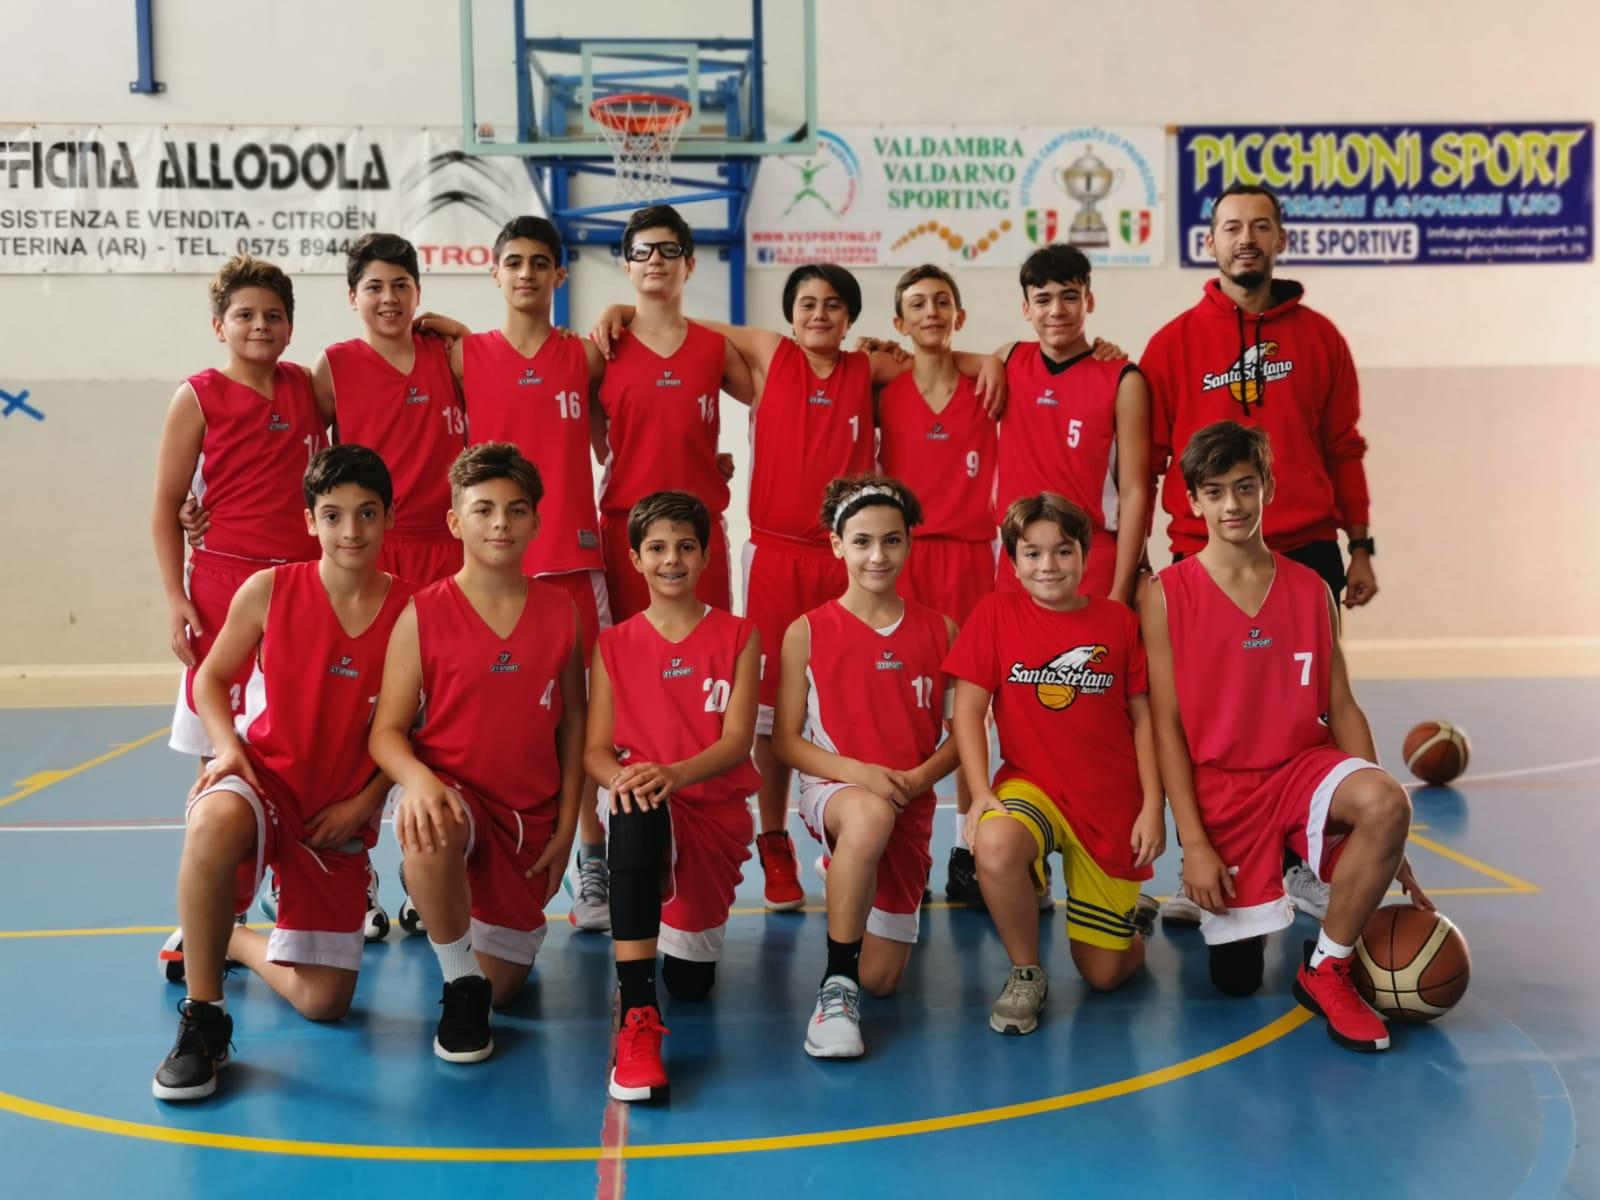 Under14: Valdambra - Santo Stefano 45-80